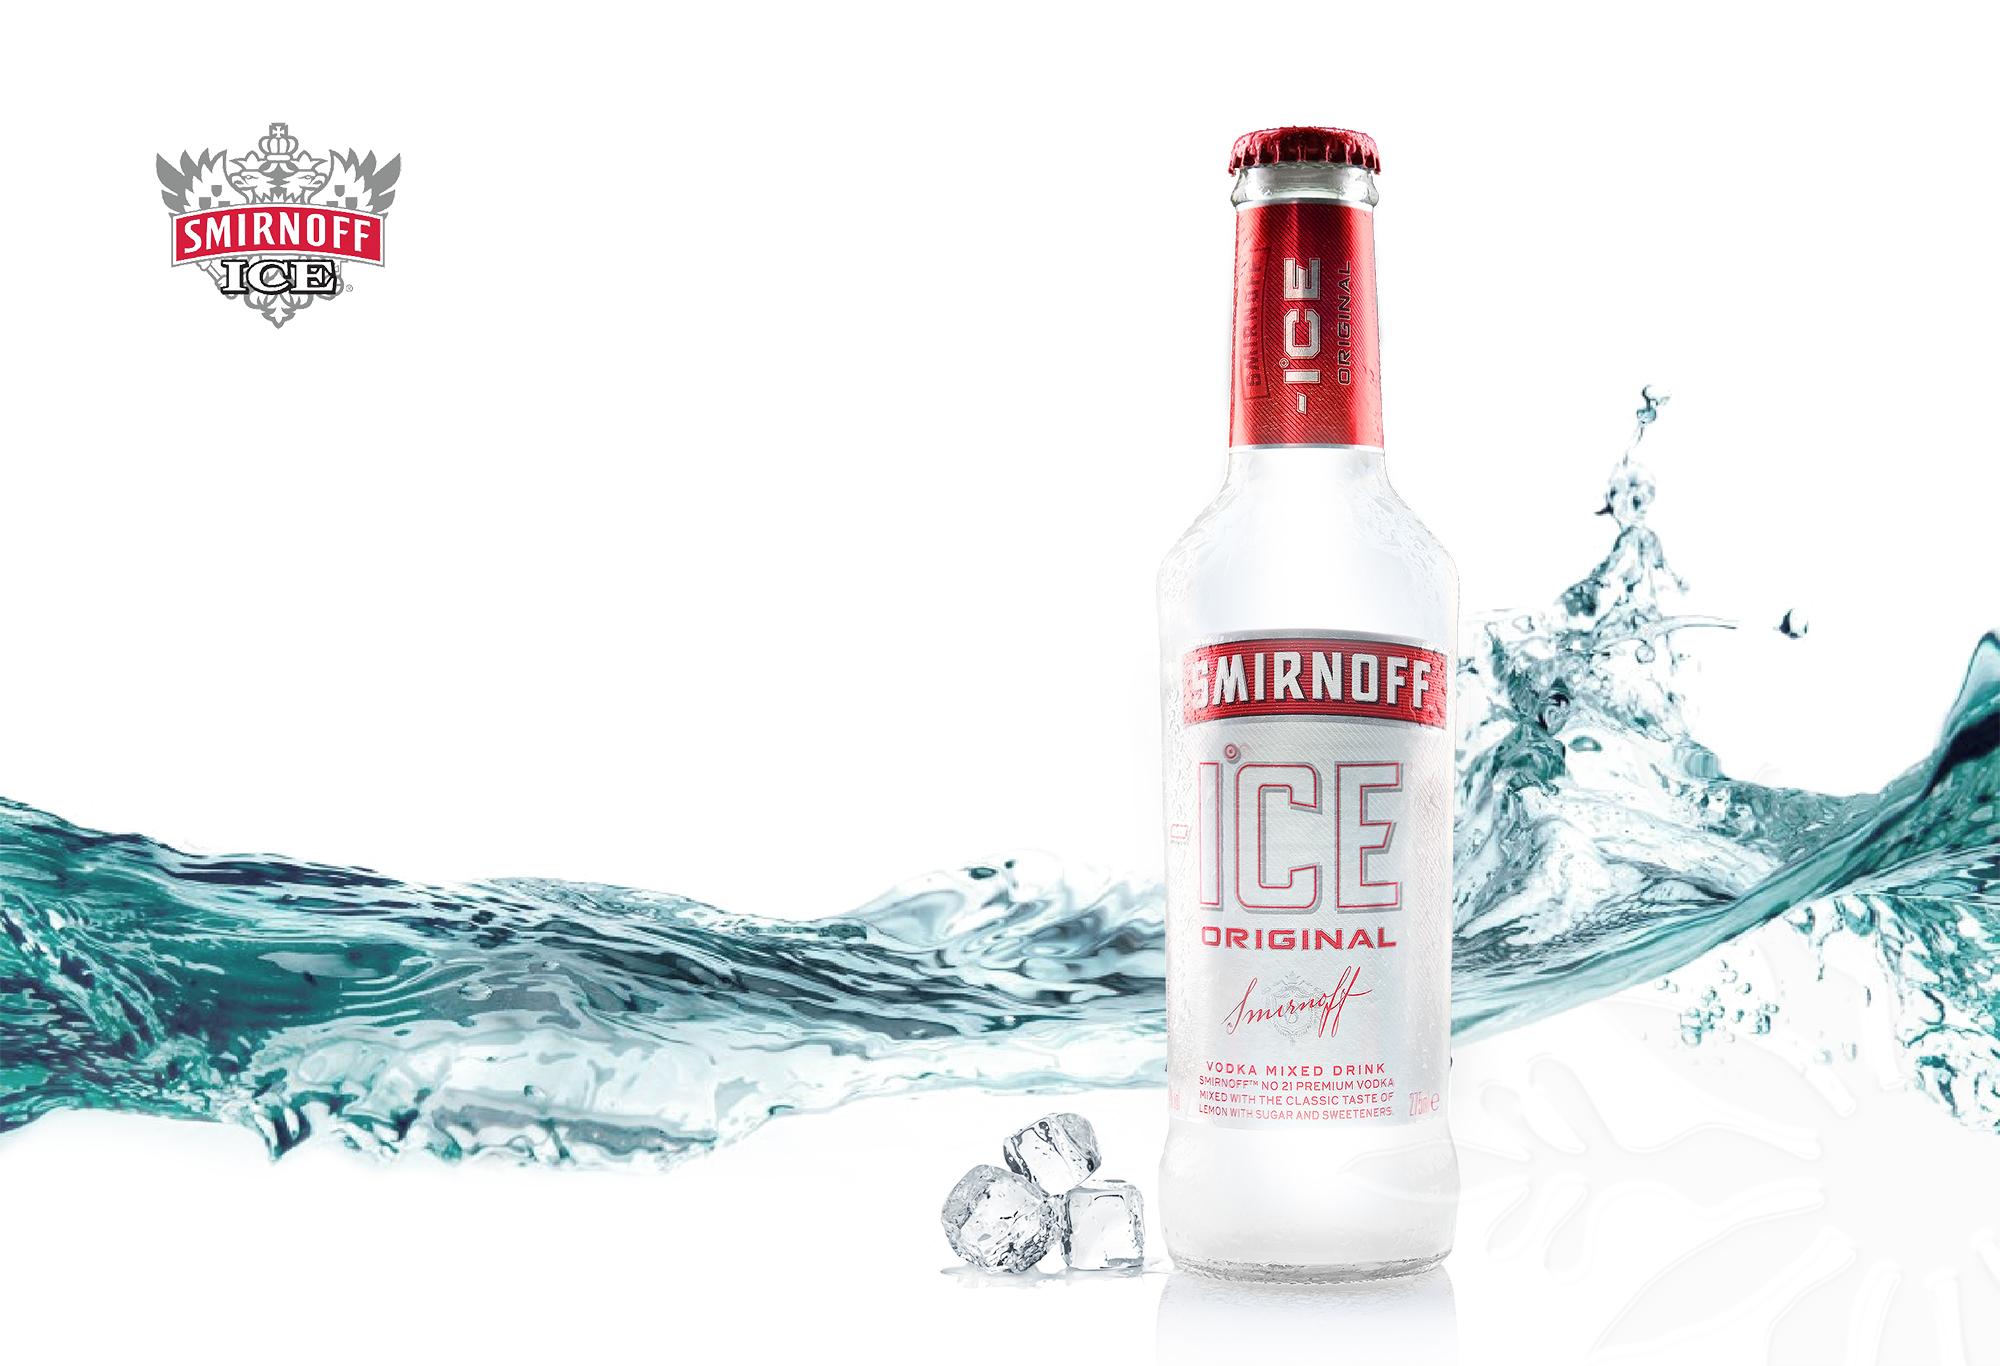 smirnoff ice S.jpg